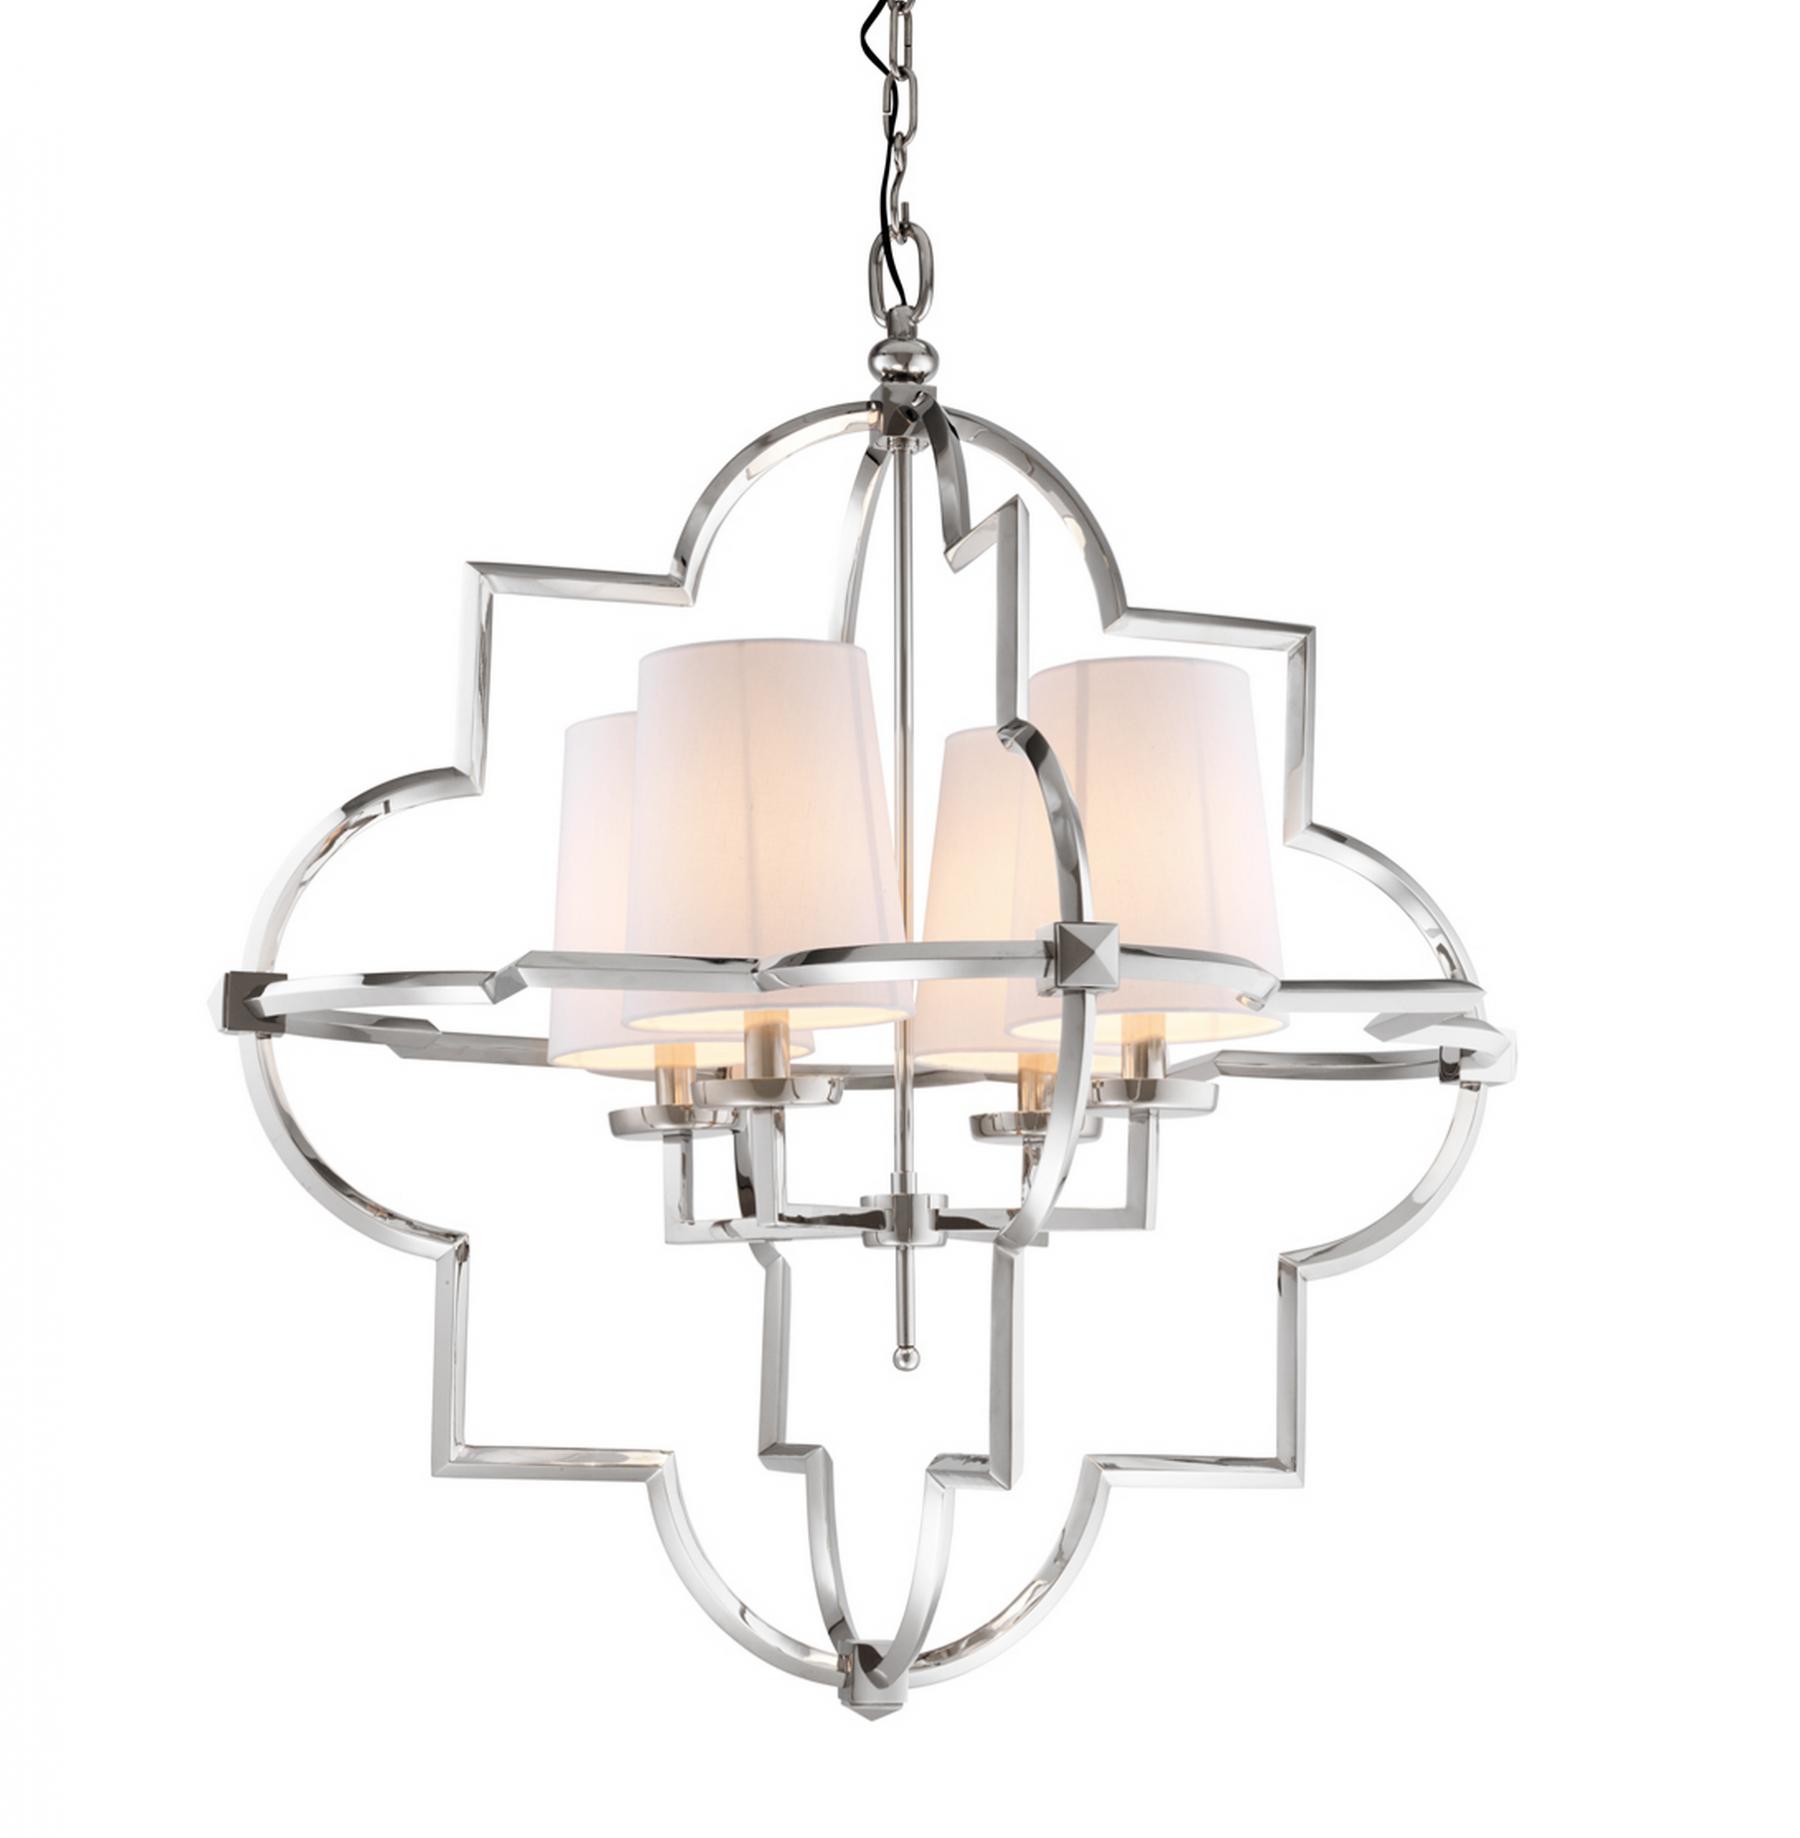 eichholtz owen lantern traditional pendant lighting. Lampa Wisząca Lantern Mandeville L Eichholtz, Mika Home Eichholtz Owen Traditional Pendant Lighting